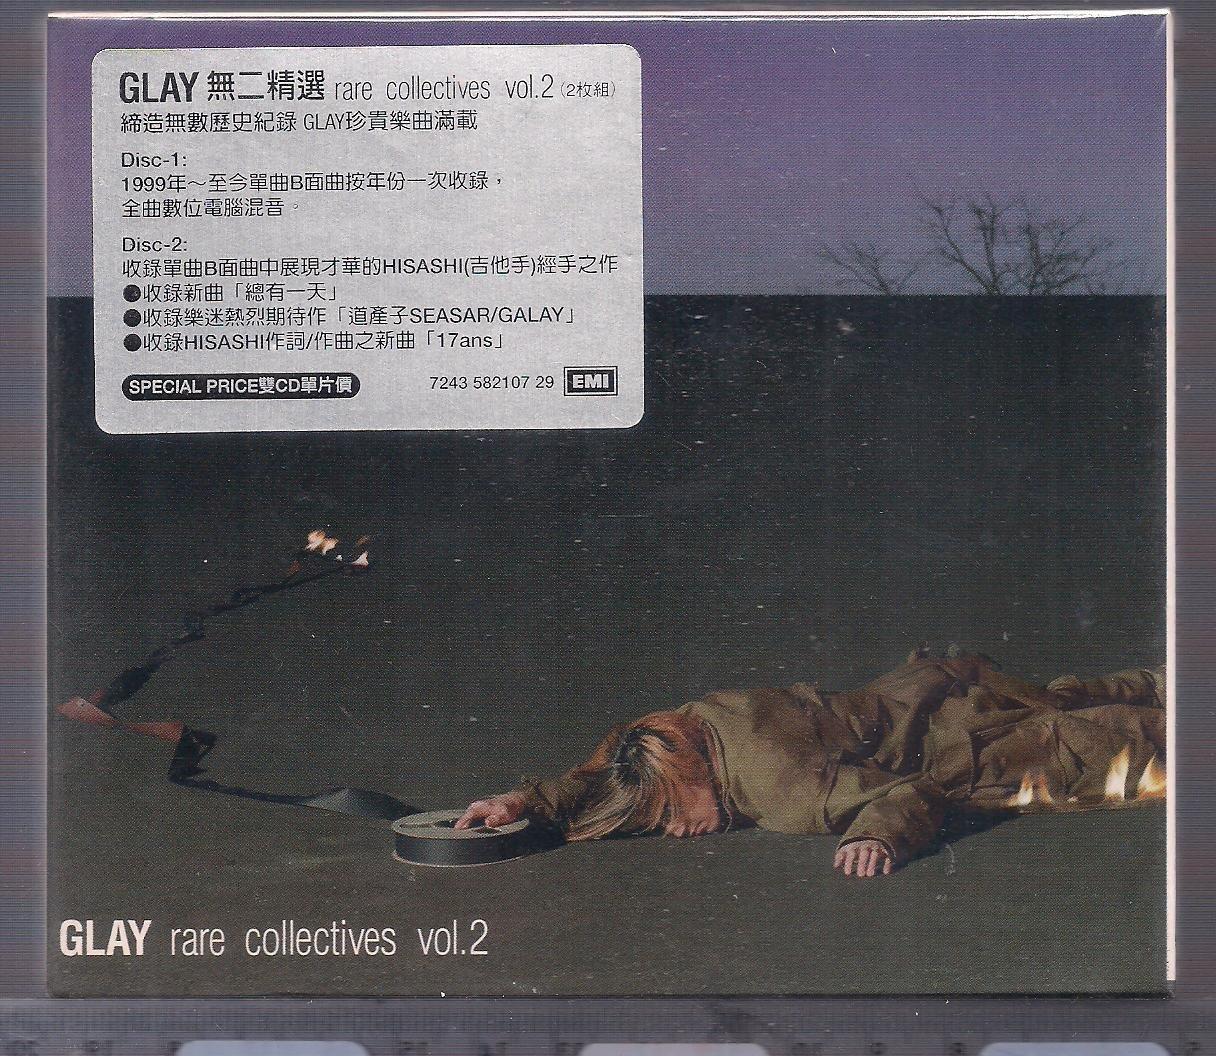 Glay  [ 無二精選 rare collectives vol.2 ] 雙CD未拆封